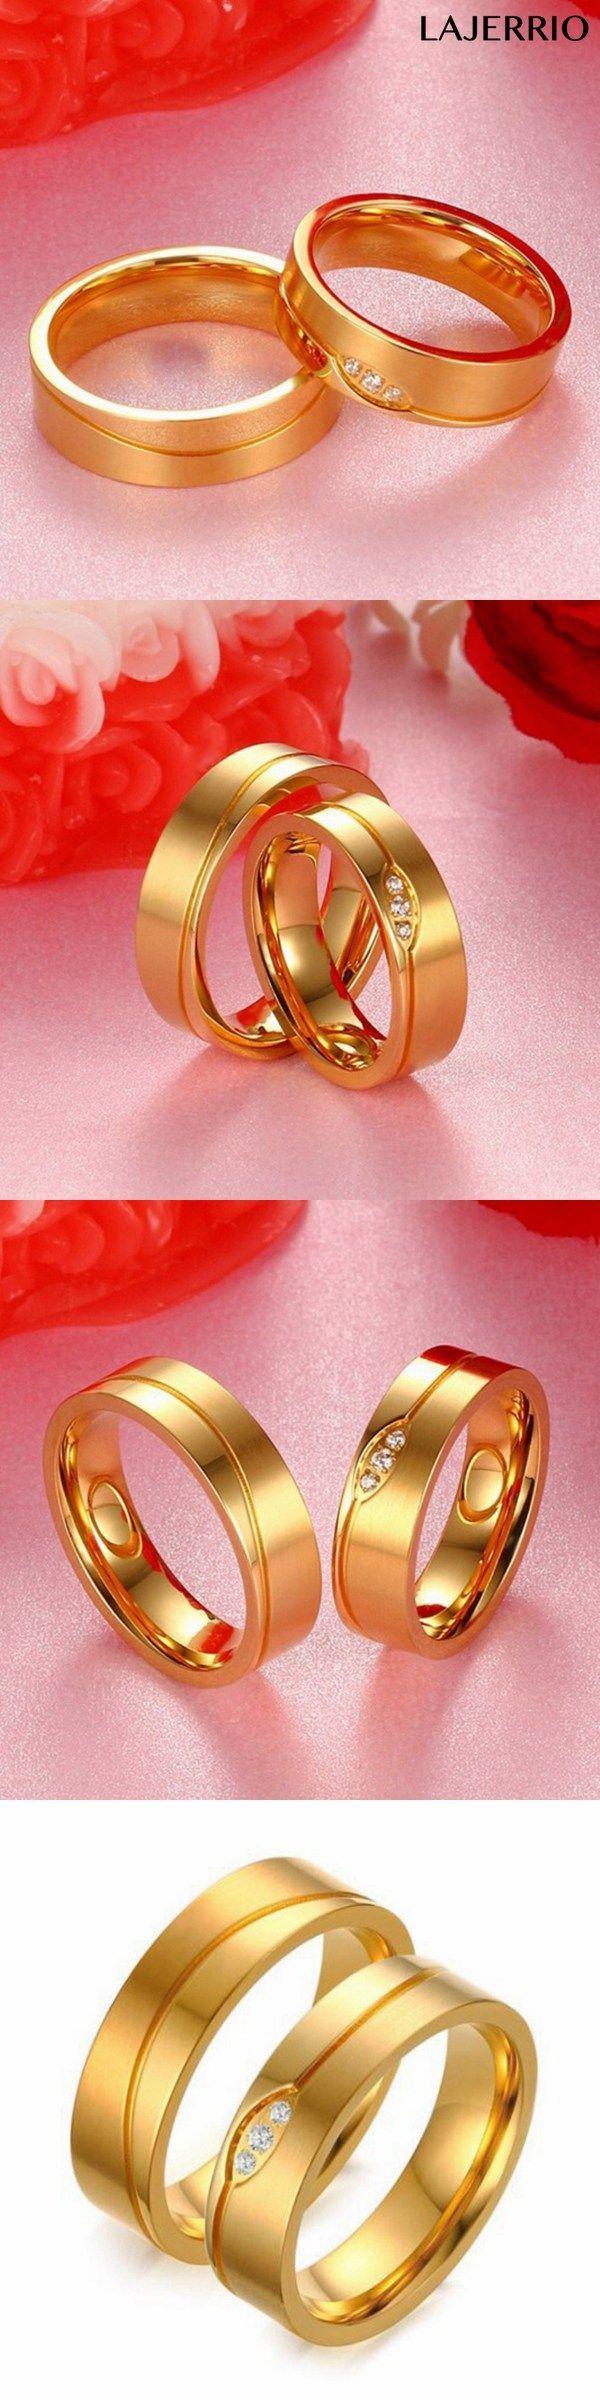 Lajerrio Jewelry Round Cut White Sapphire Gold Titanium Steel ...